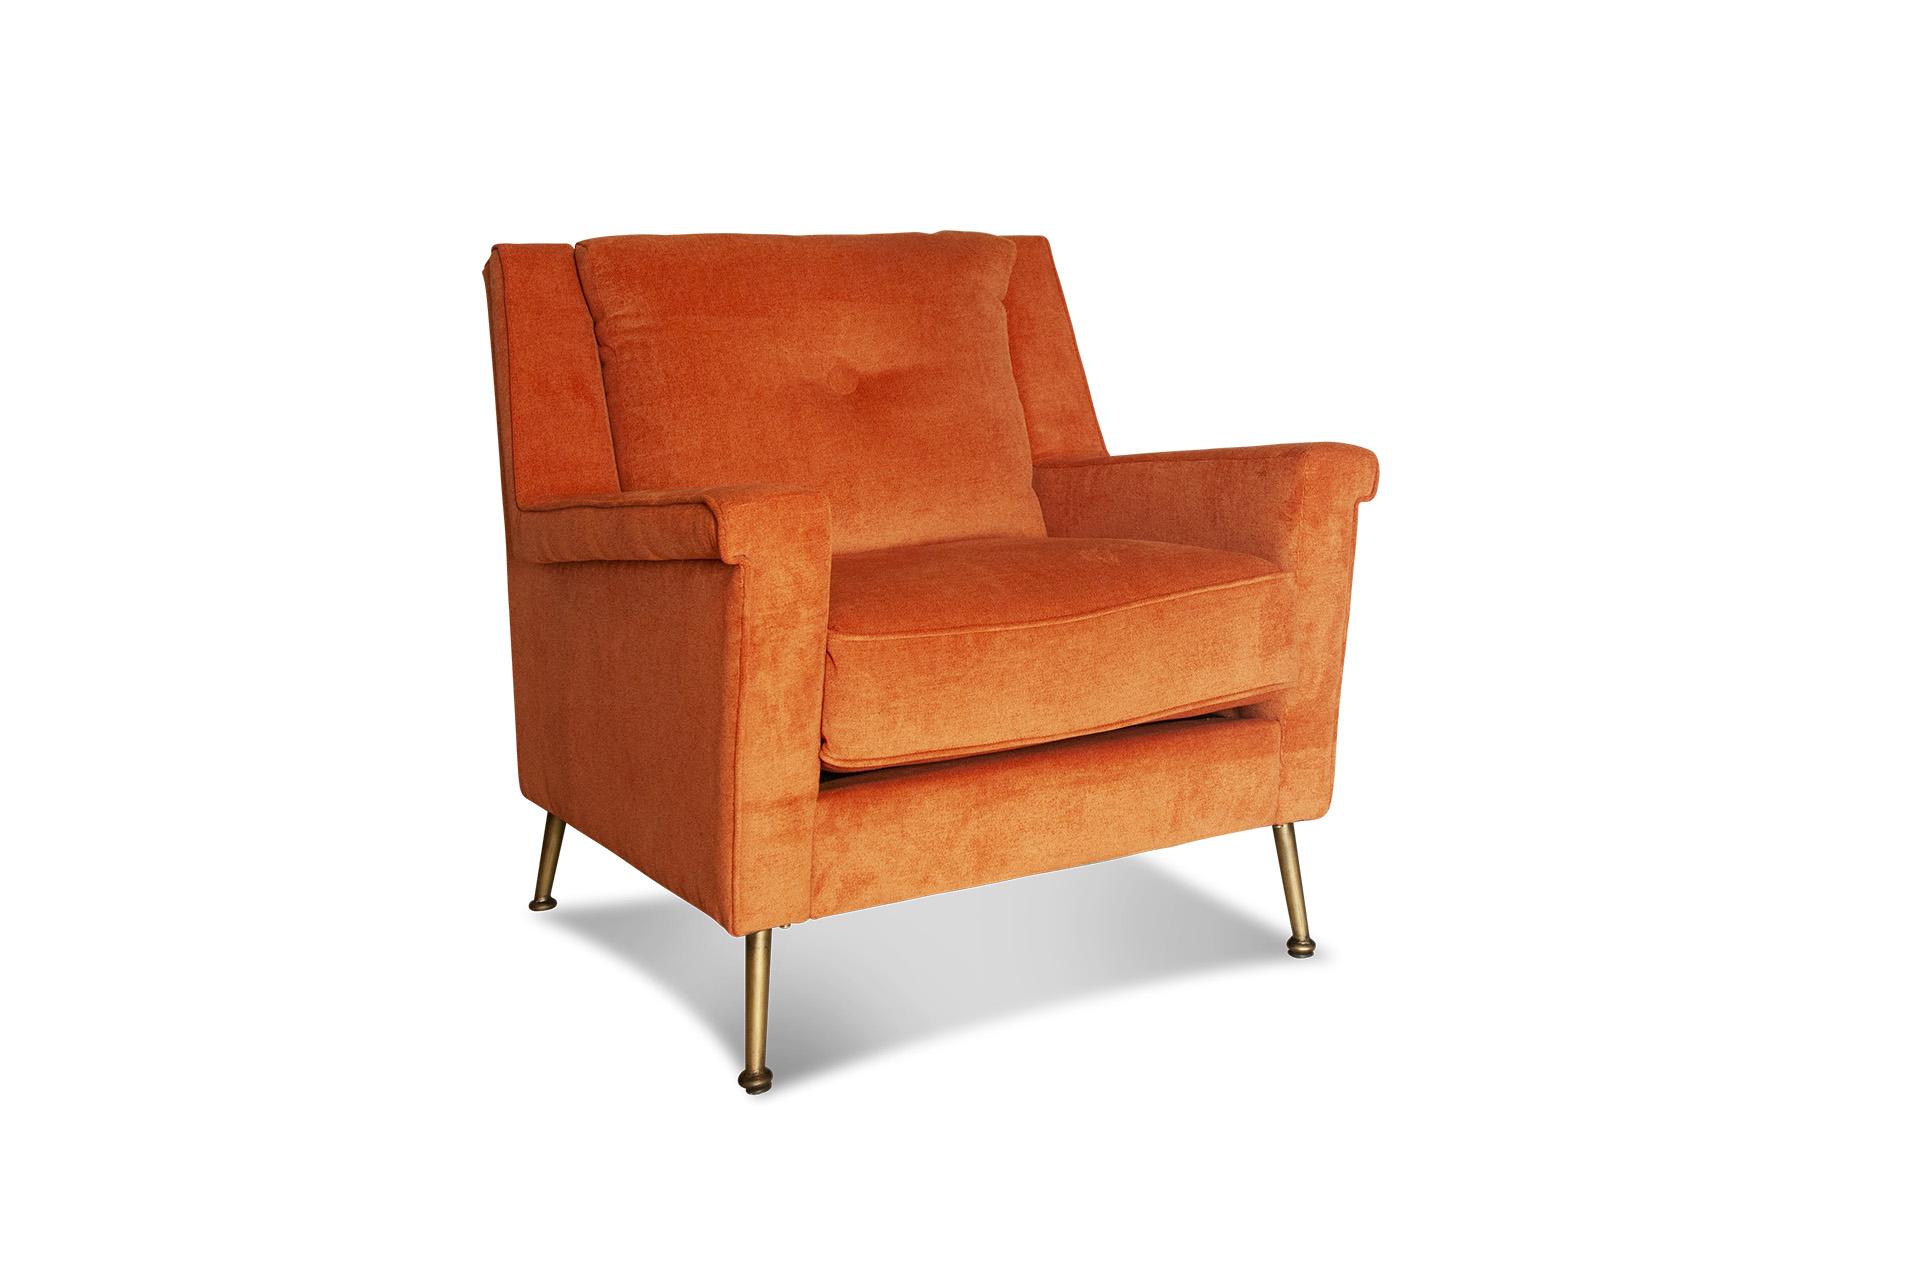 Fauteuil en velours orange